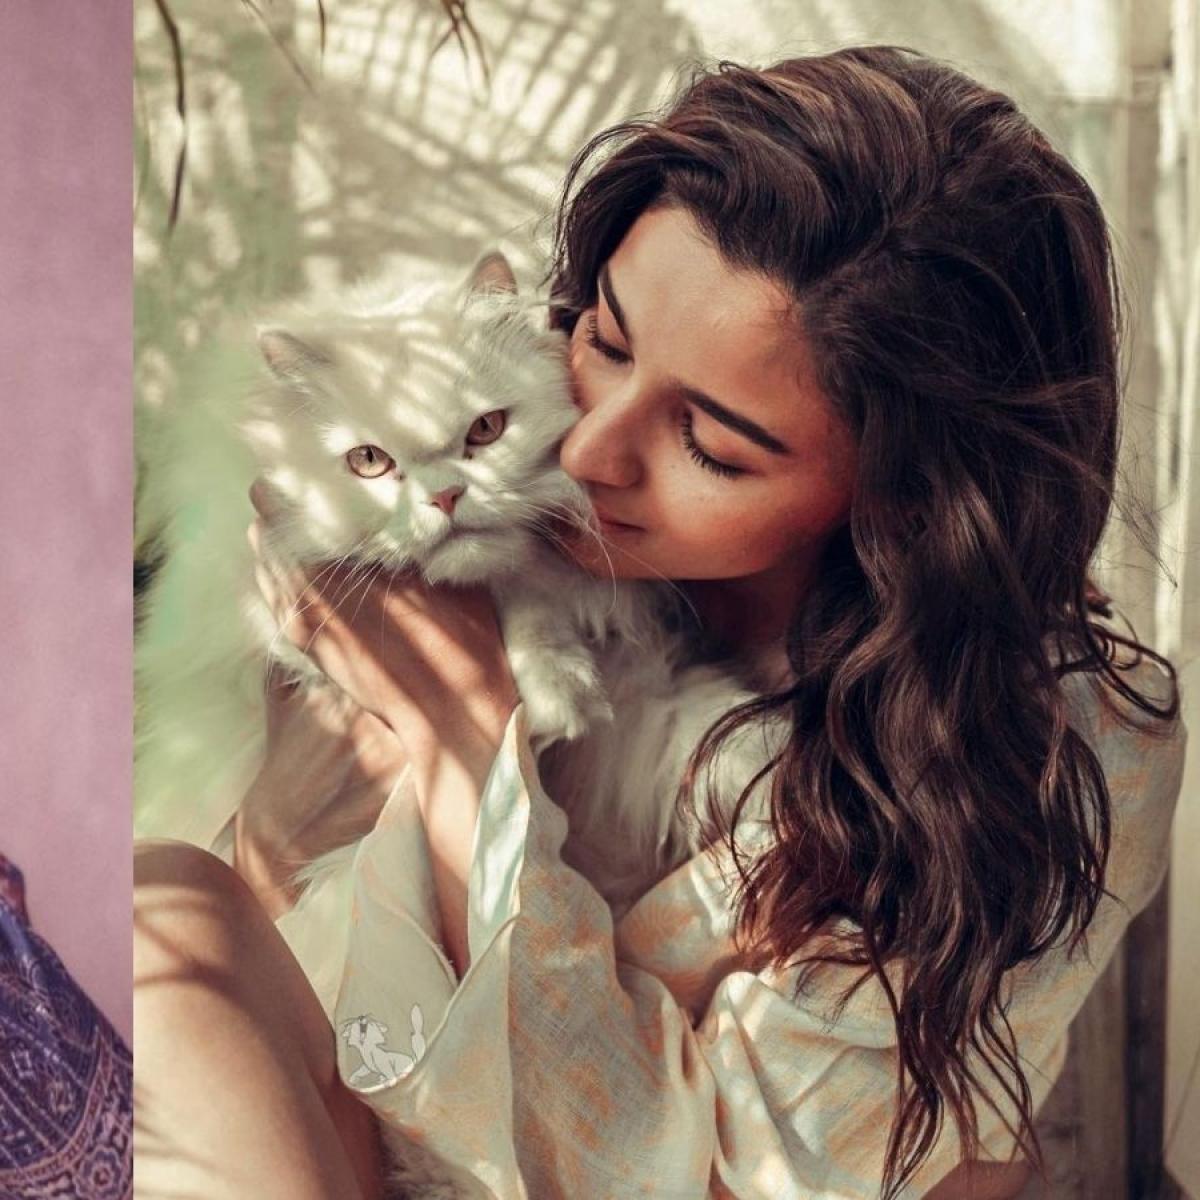 Neetu Kapoor introduces Alia Bhatt's cat Edward as a 'new friend'